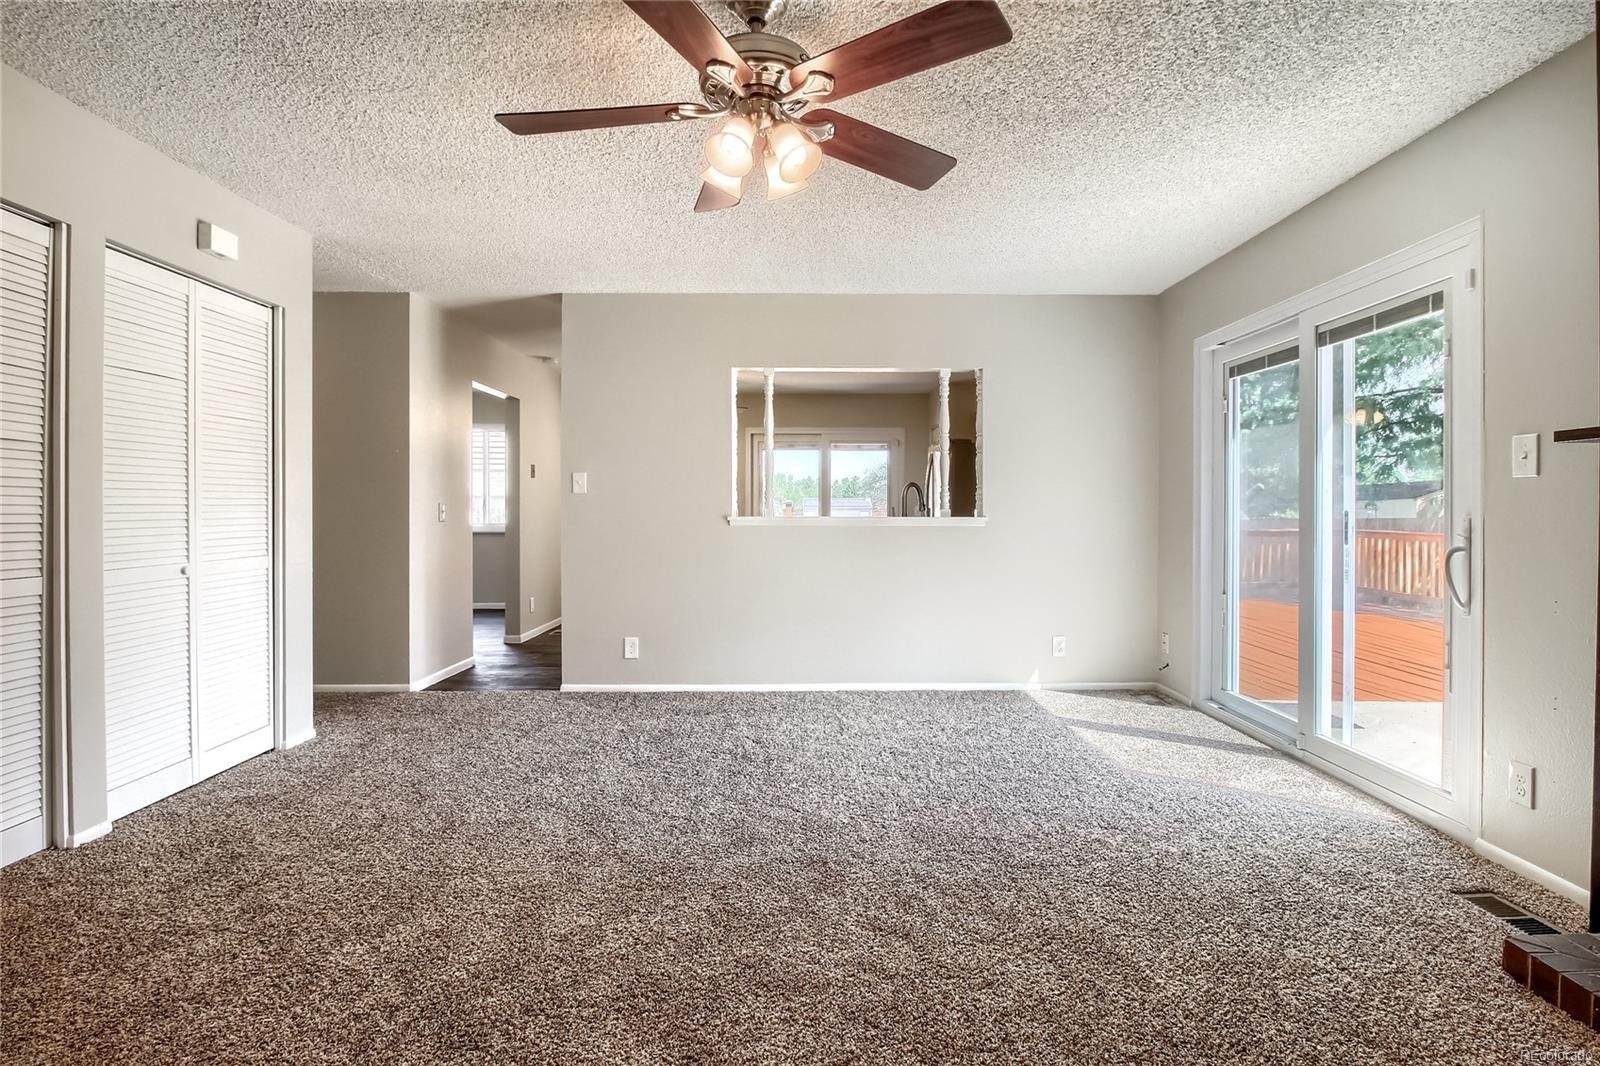 MLS# 4817896 - 10 - 5080 Worchester Street, Denver, CO 80239